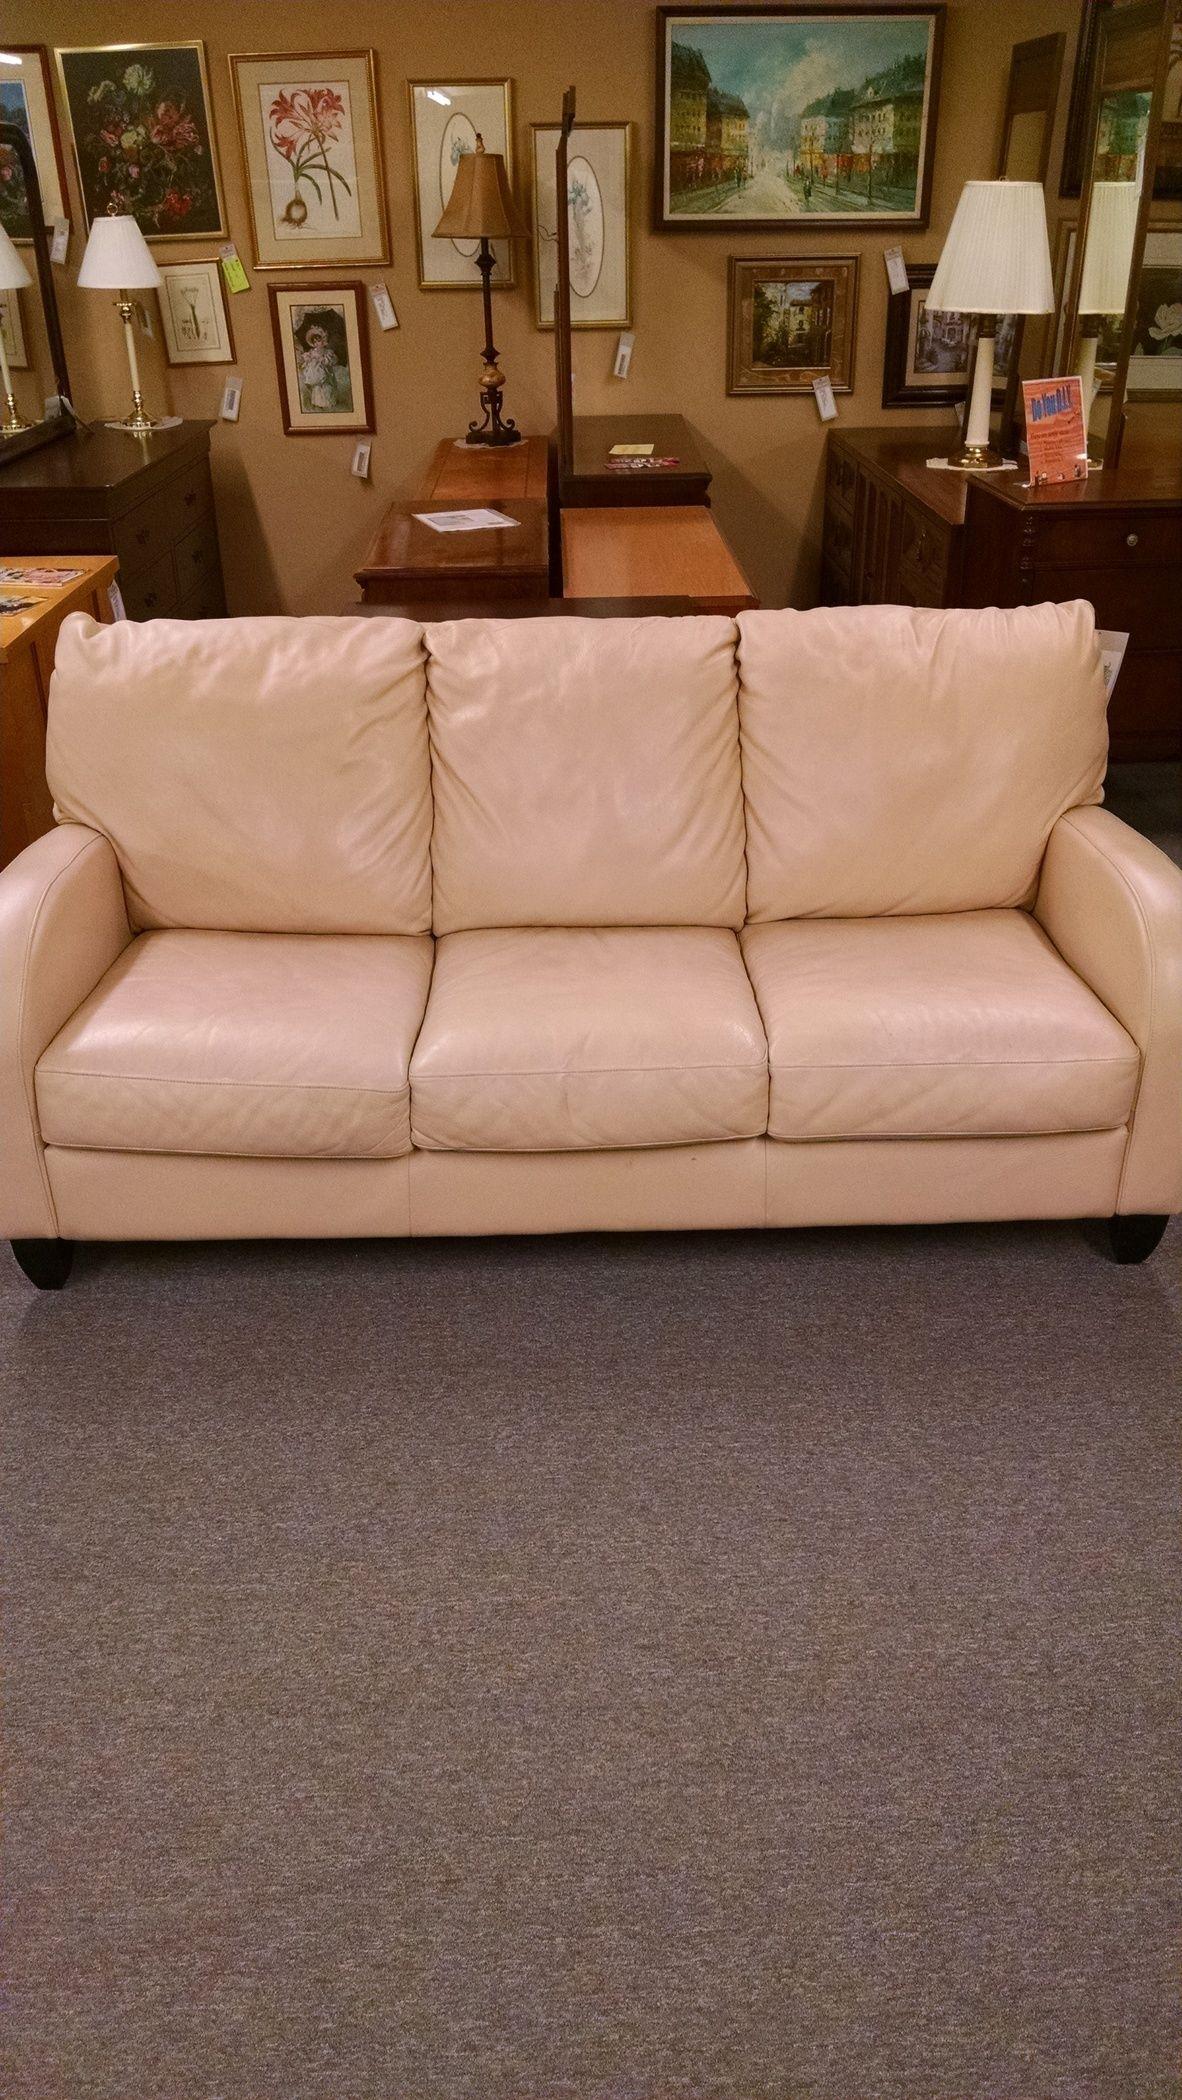 cream colored leather sofas sofa protector for dogs color delmarva furniture consignment